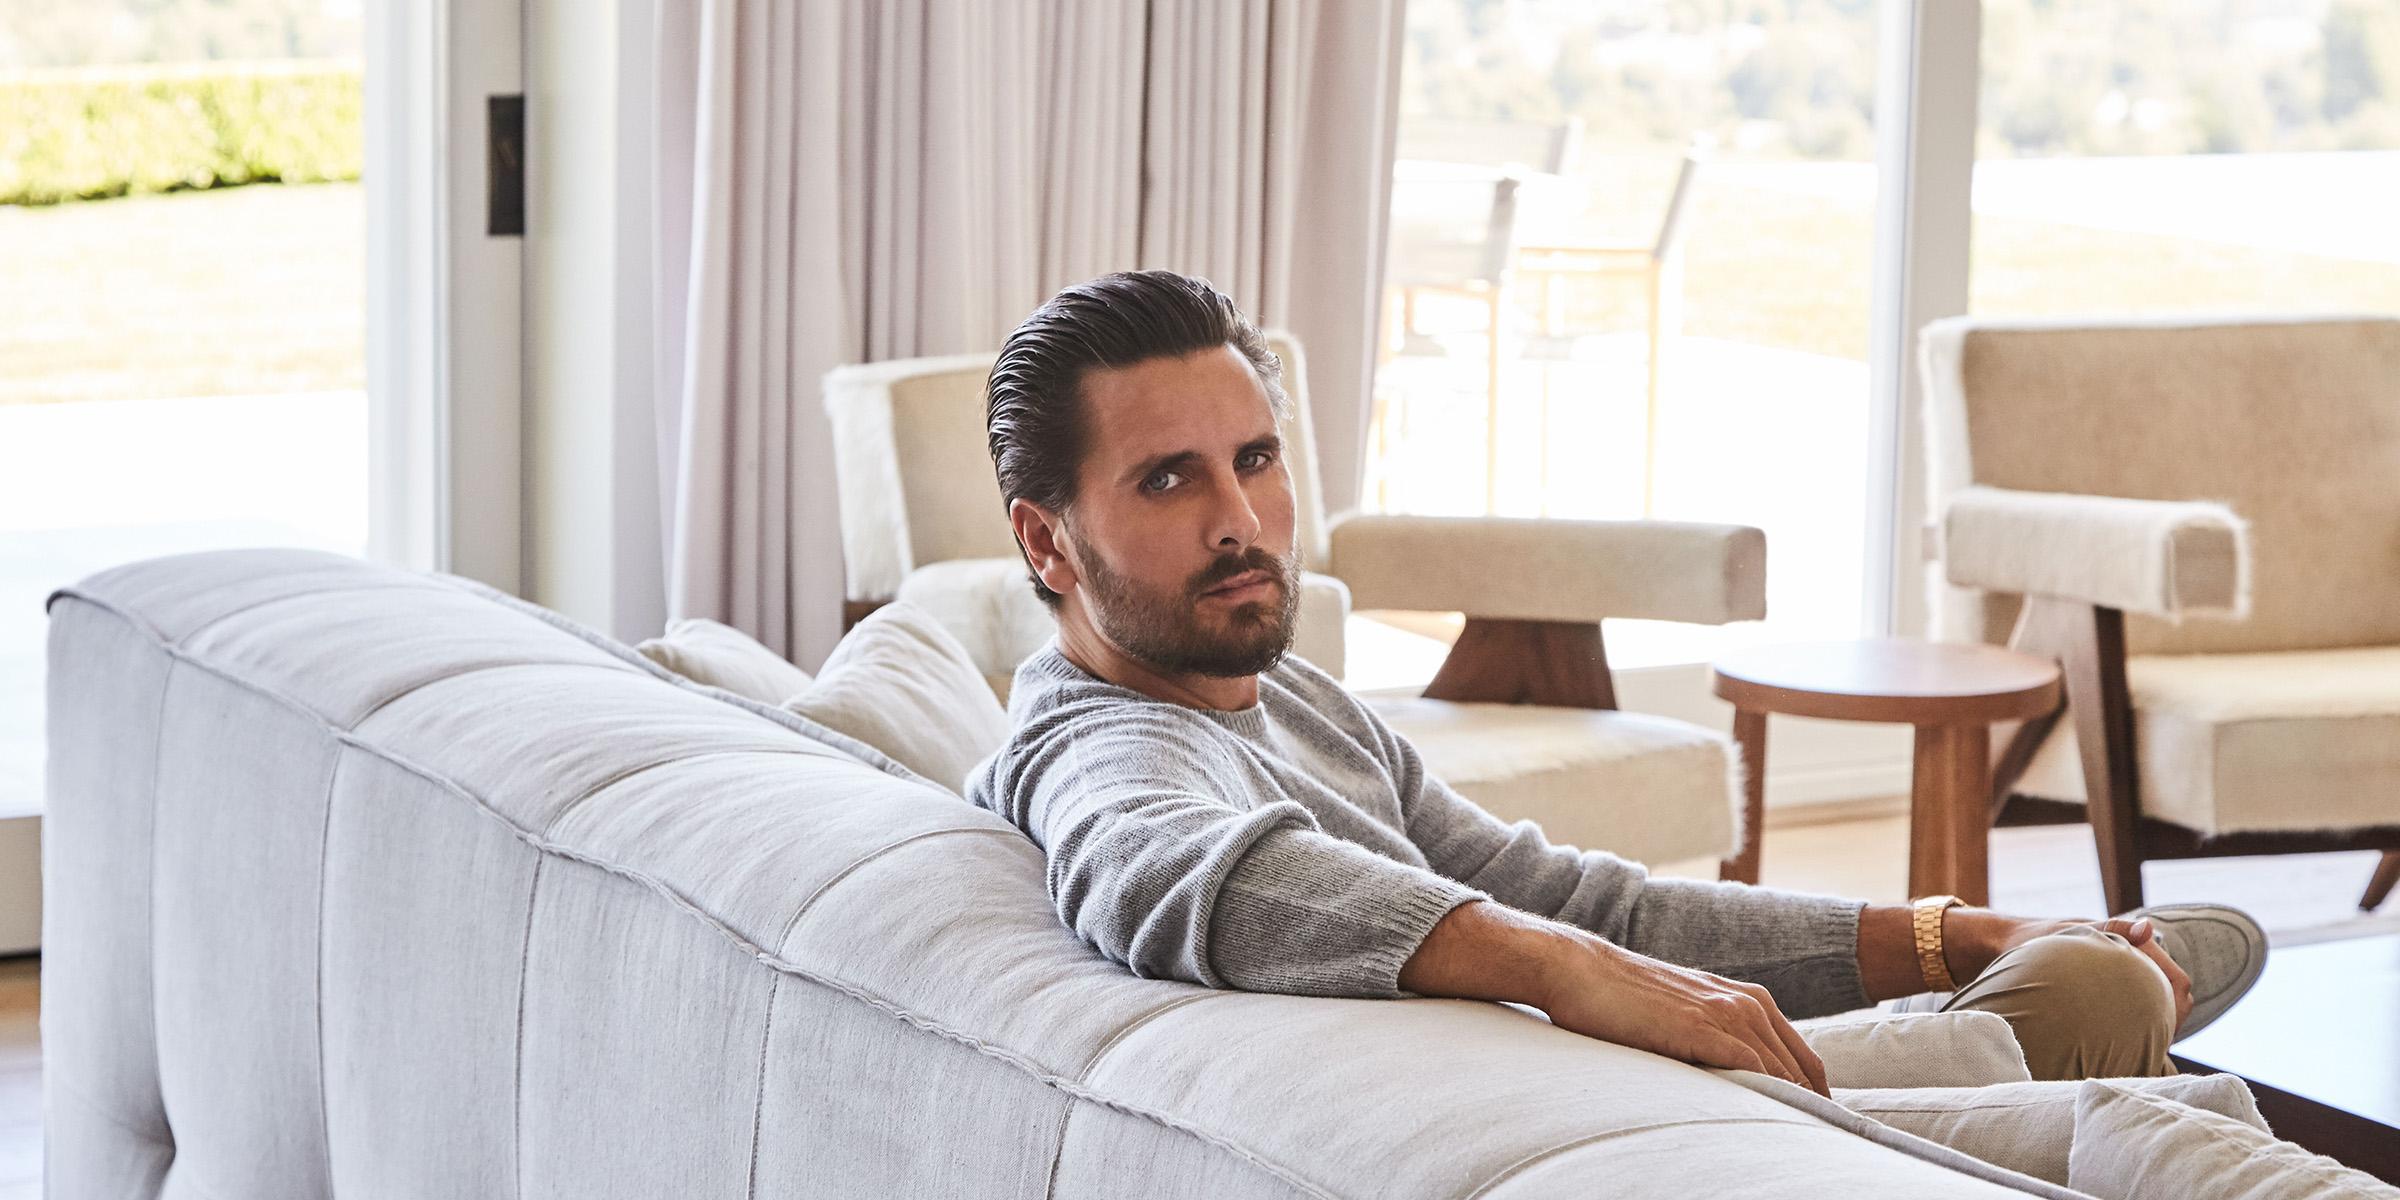 See inside Scott Disick's sleek and minimalist California home